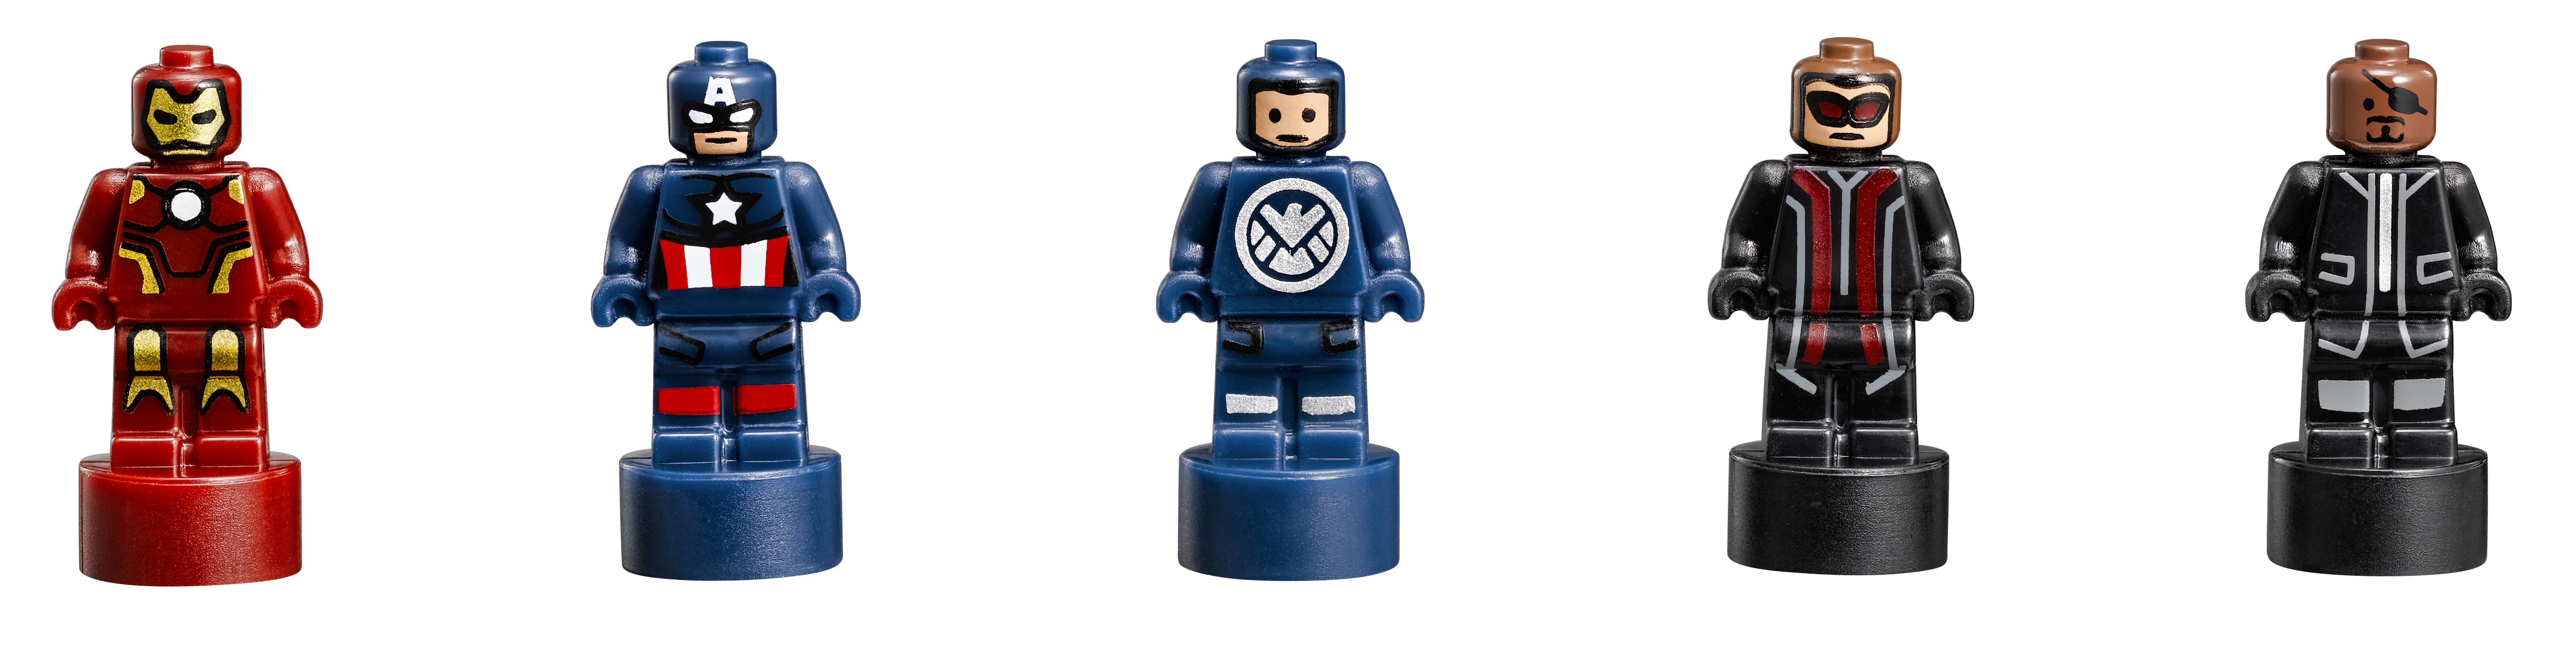 Avengers Microfigs   LEGO-76042-SHIELD-Helicarrier   LEGO ...